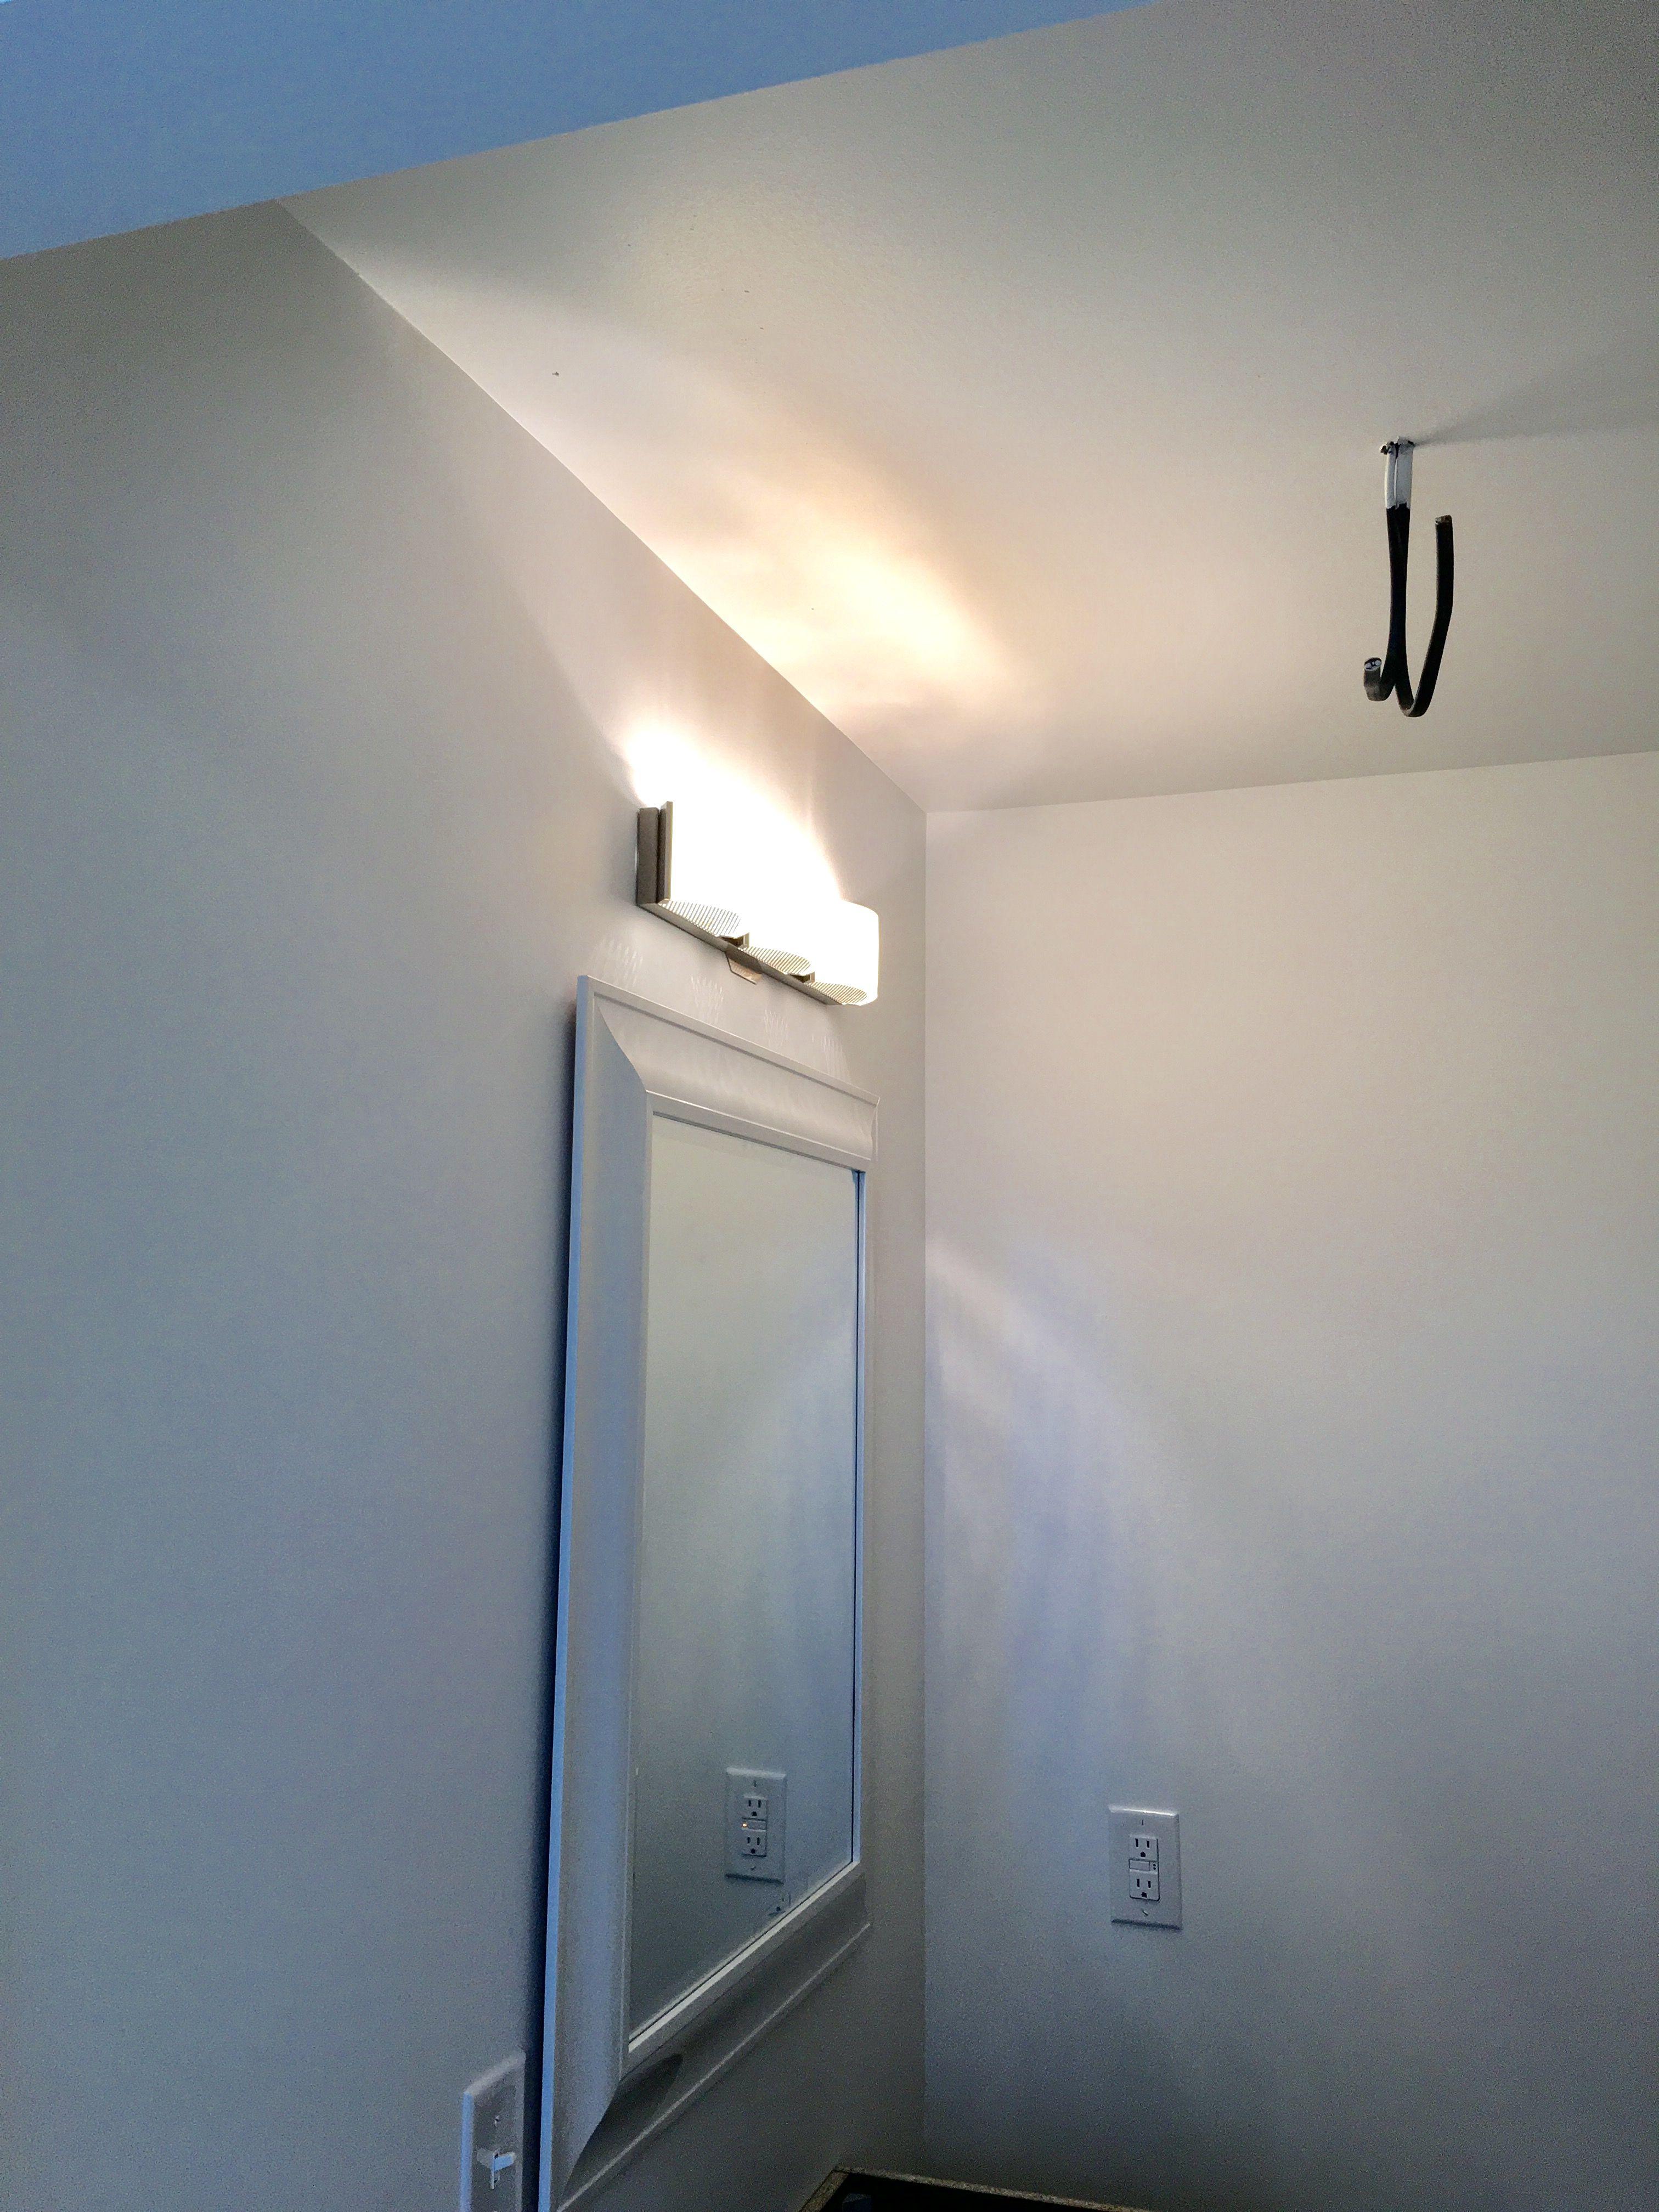 Bathroom Led Light Fixture  Amazon  And White Framed